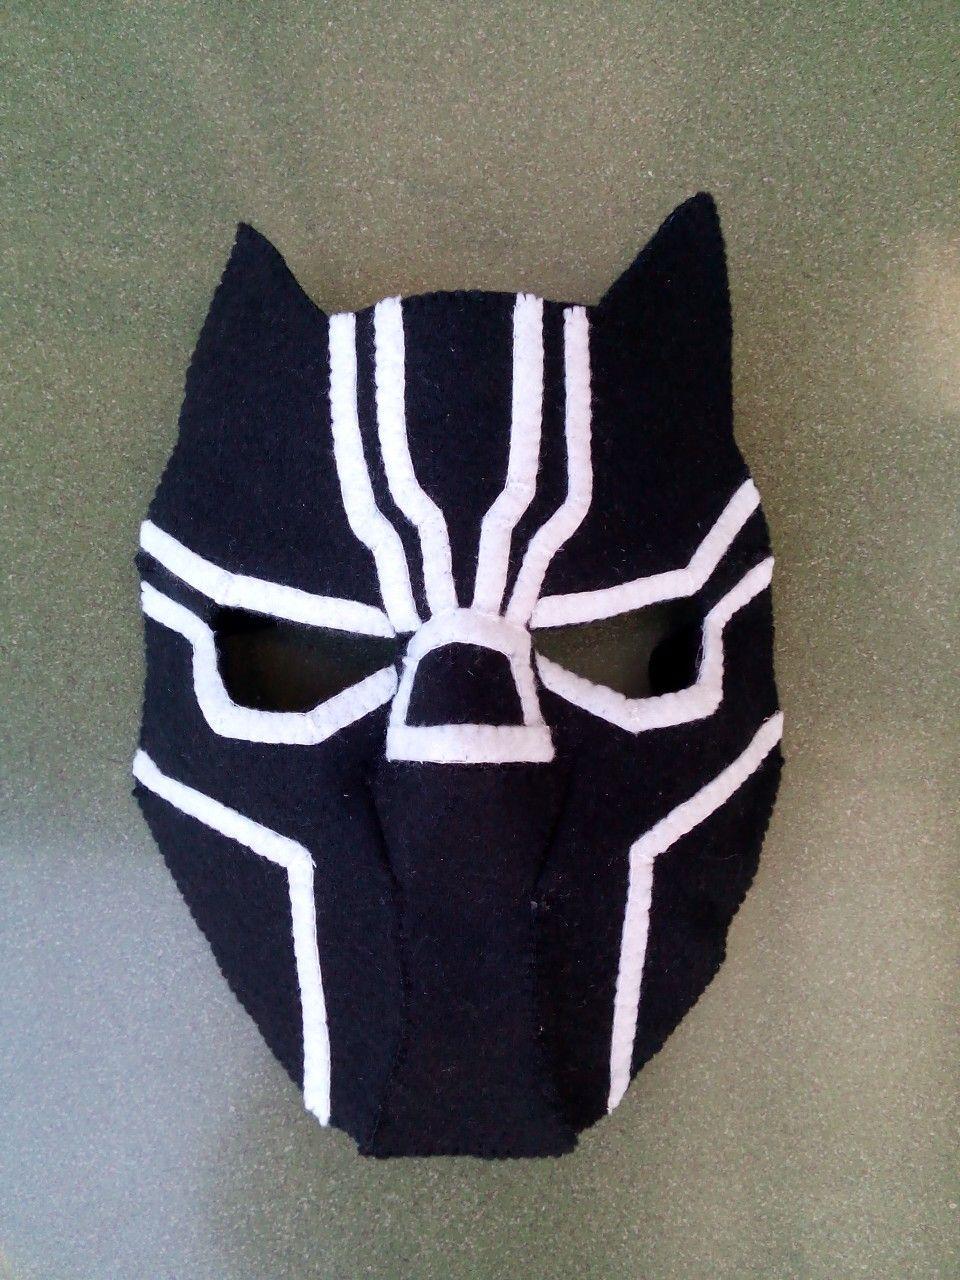 208dea32 Black panther felt mask by Dinofancy Craft   felt diy   Black ...